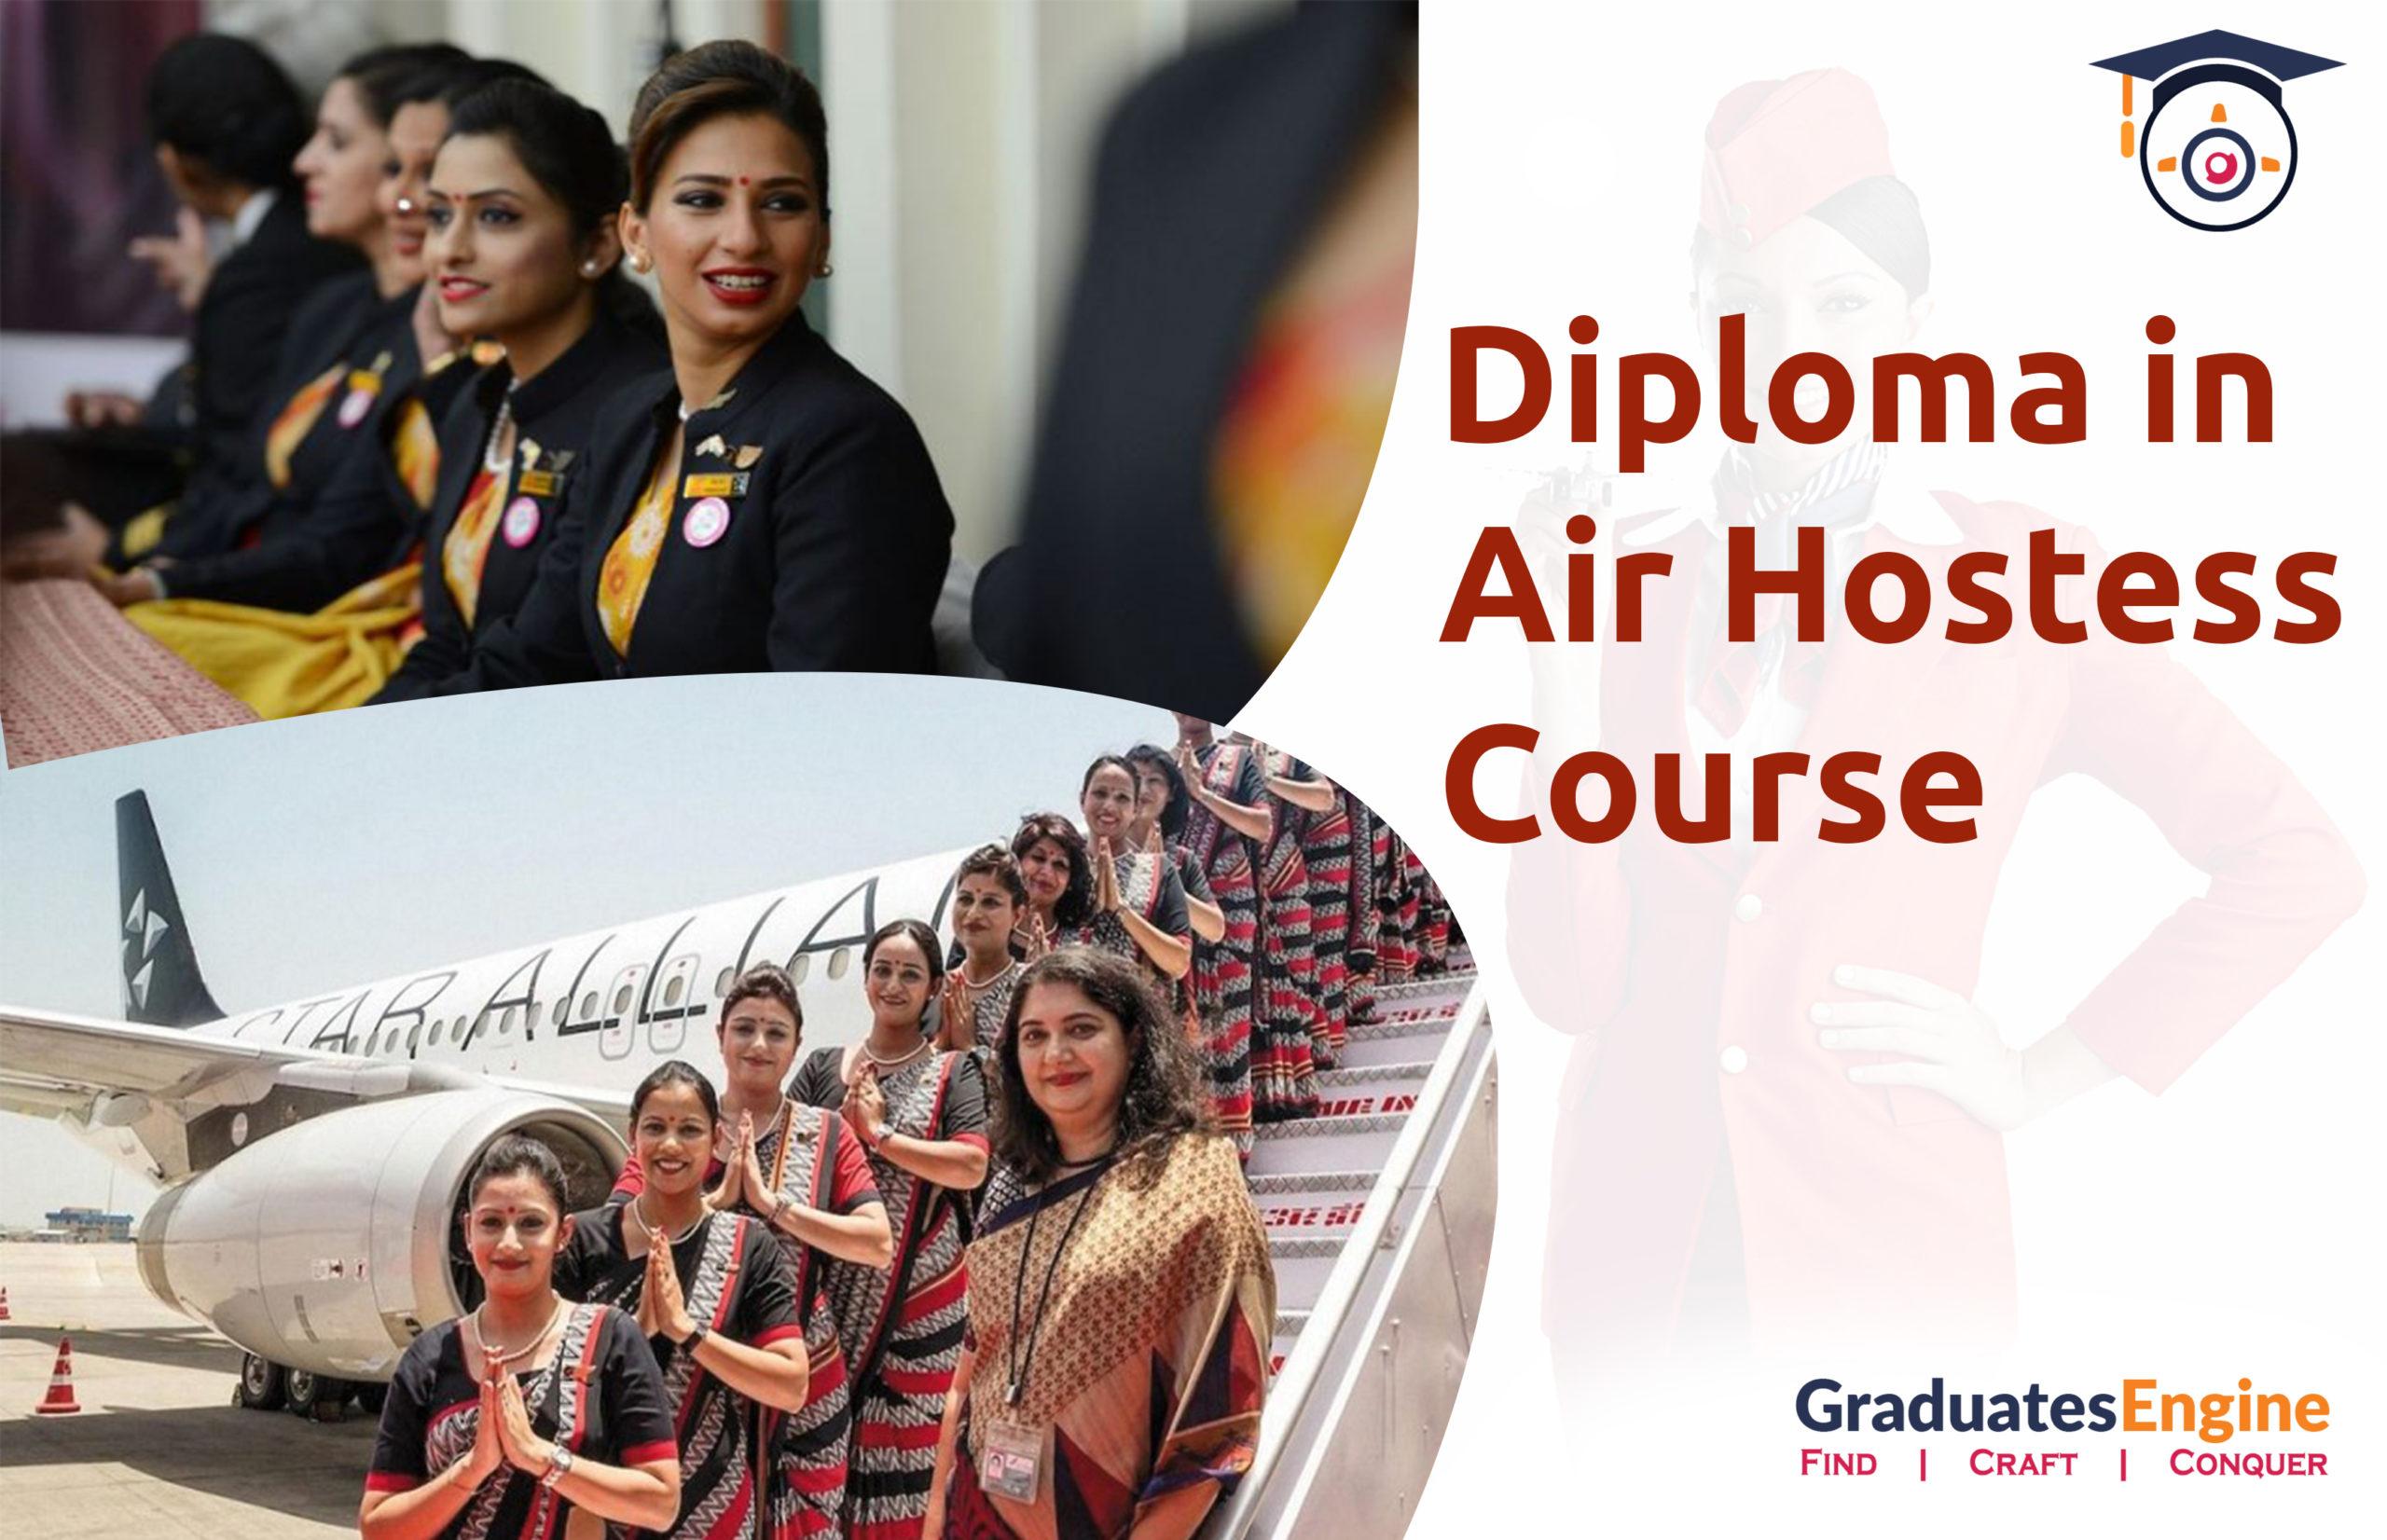 Diploma In Air Hostess course